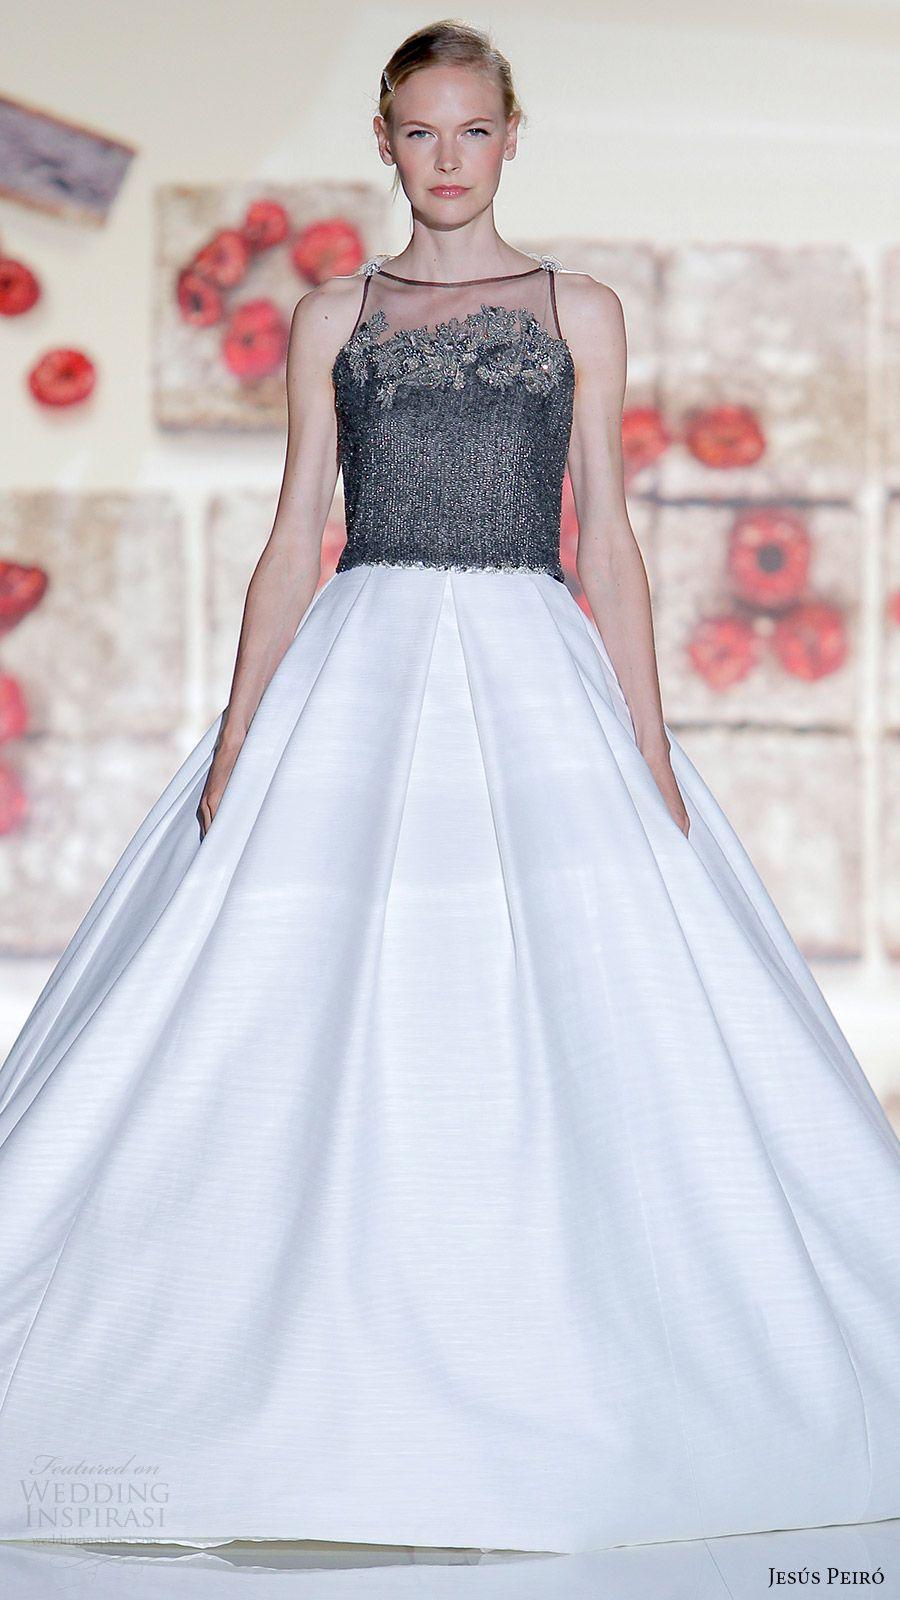 Jesus peiro wedding dresses u ucmirtilliud bridal collection